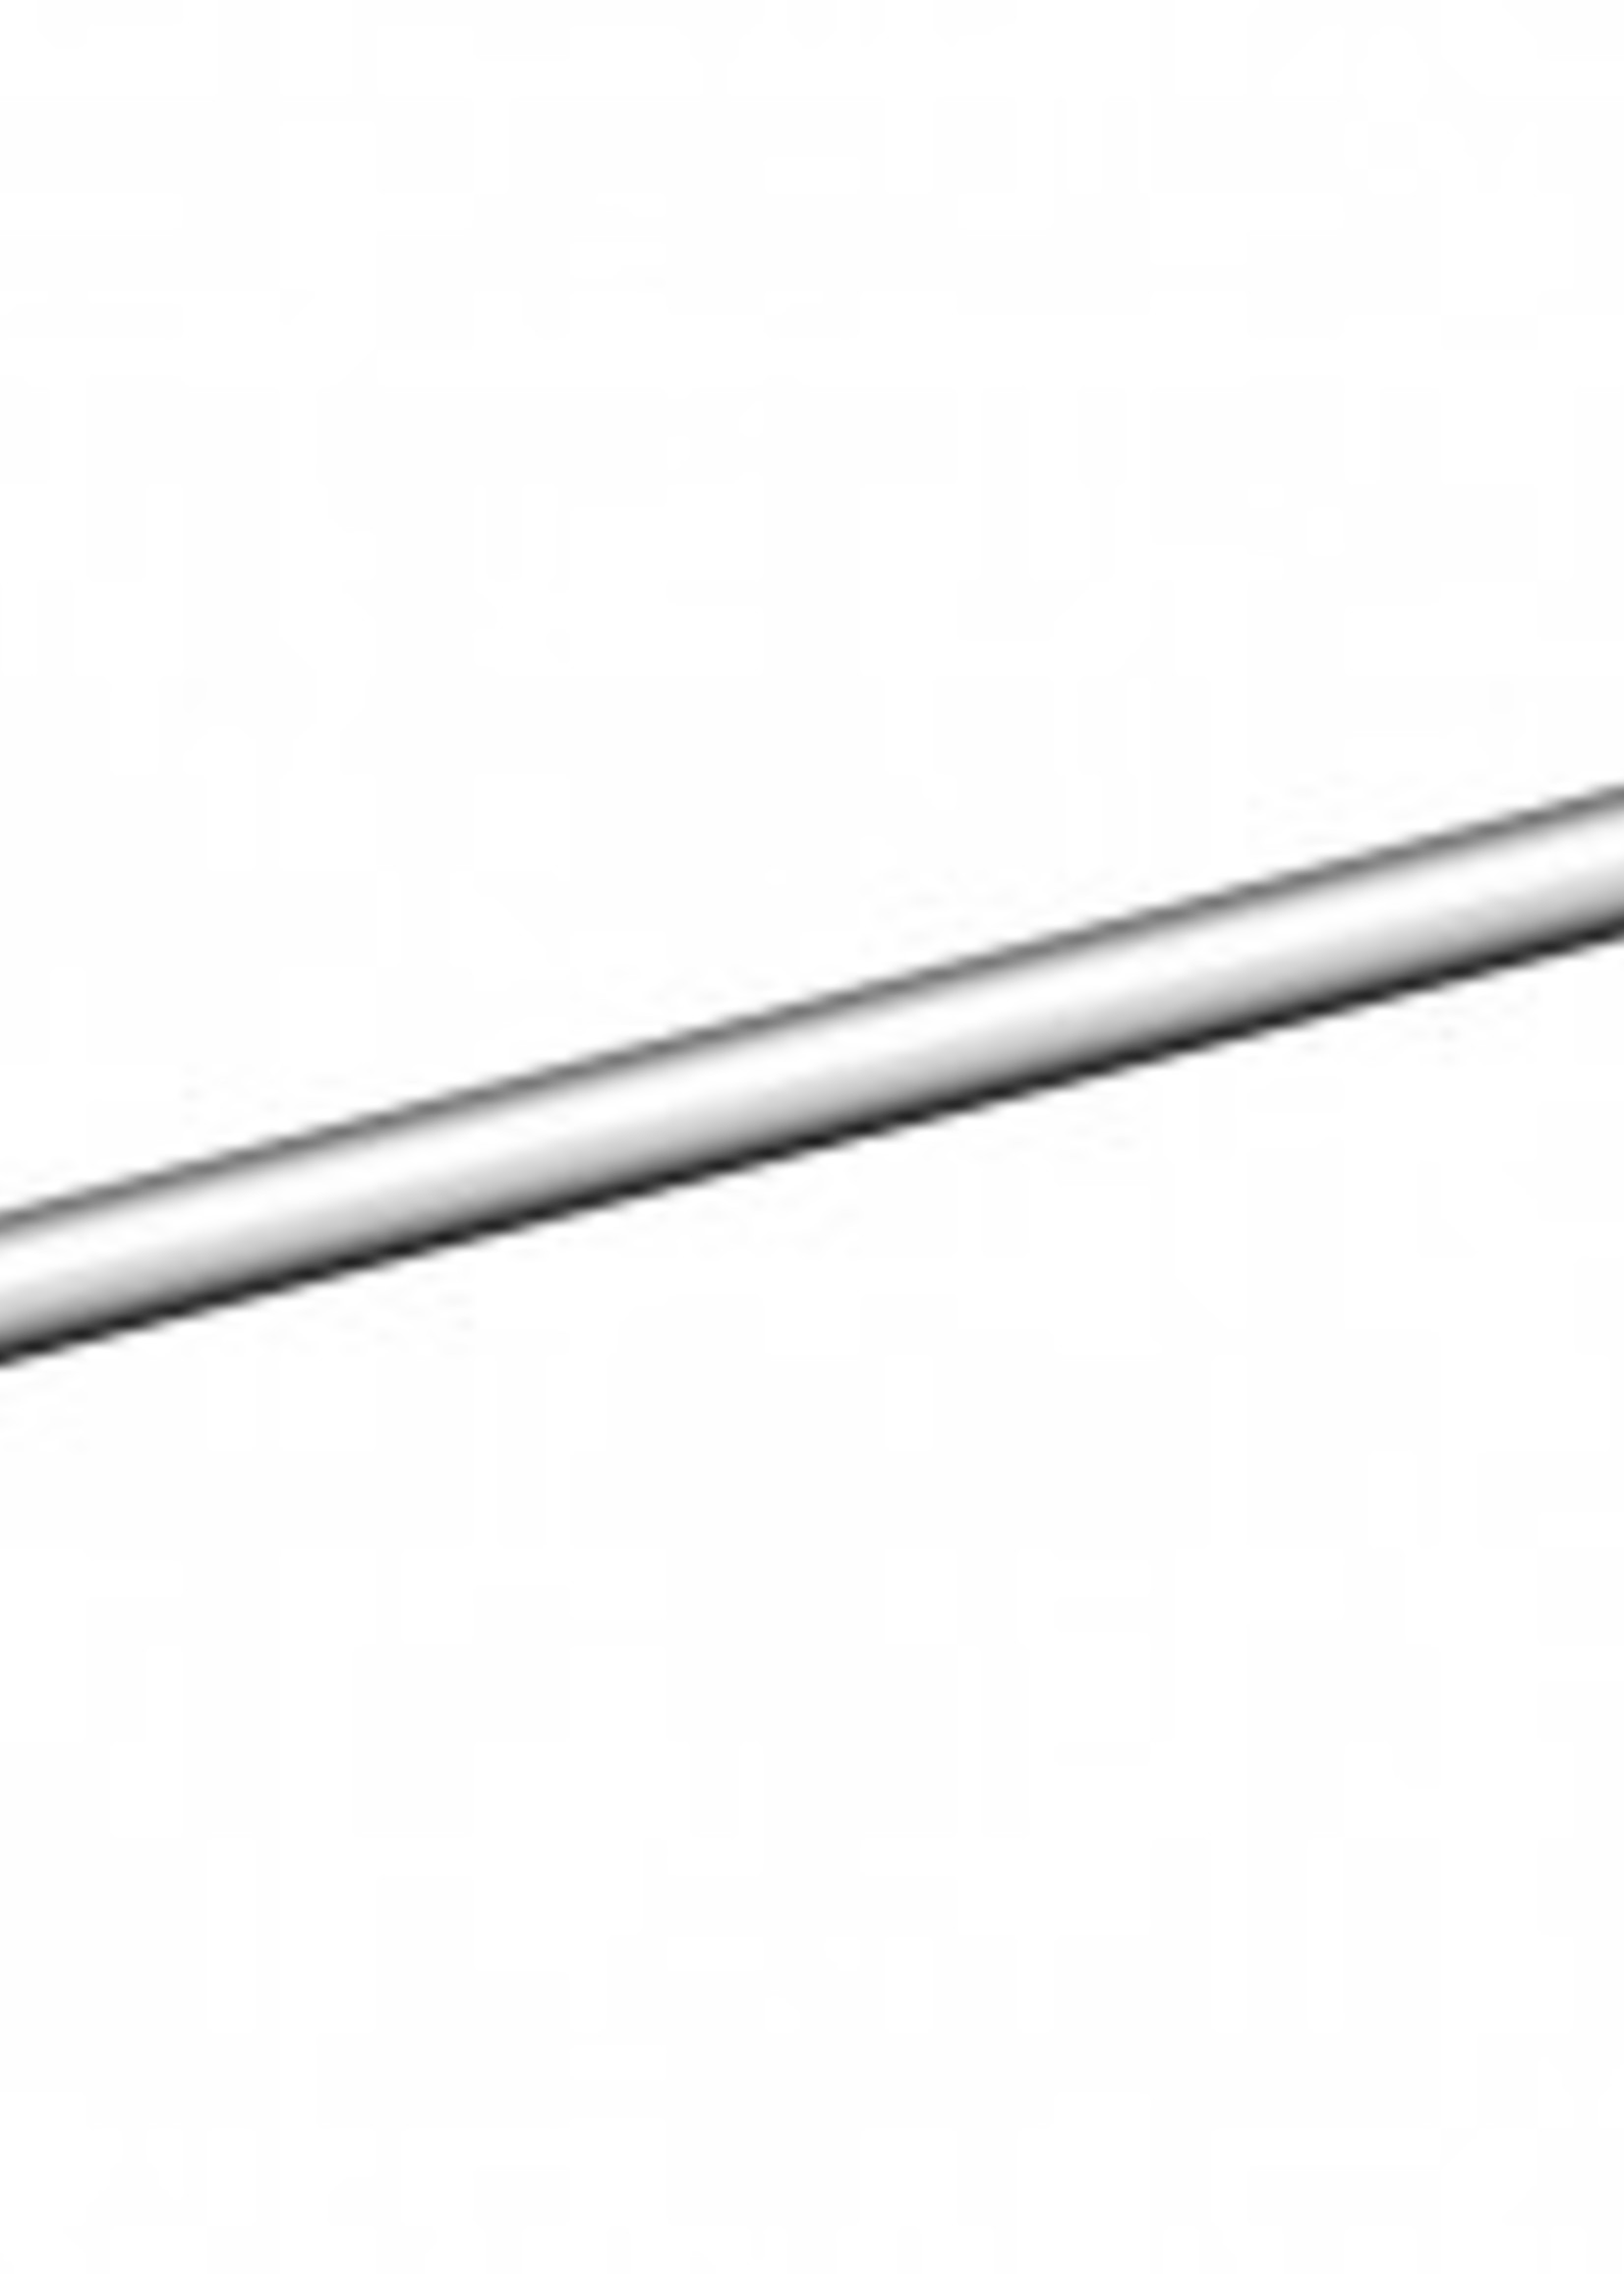 Layher Diagonaal 0.73 x 2.00 meter